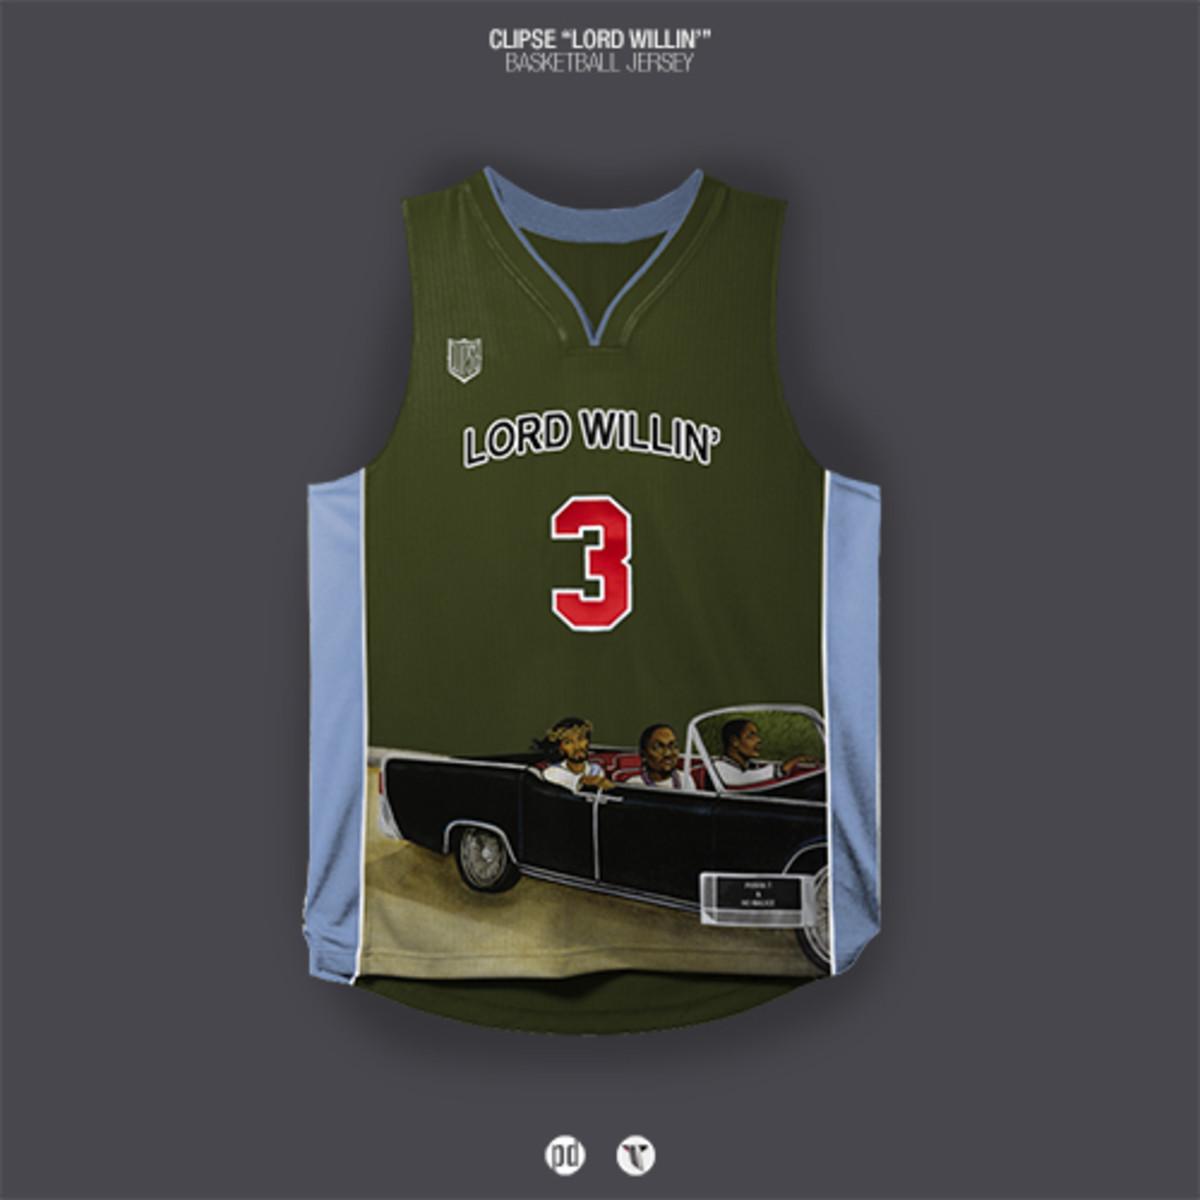 Clipse-pusha-t-lord-willin-jersey.jpg